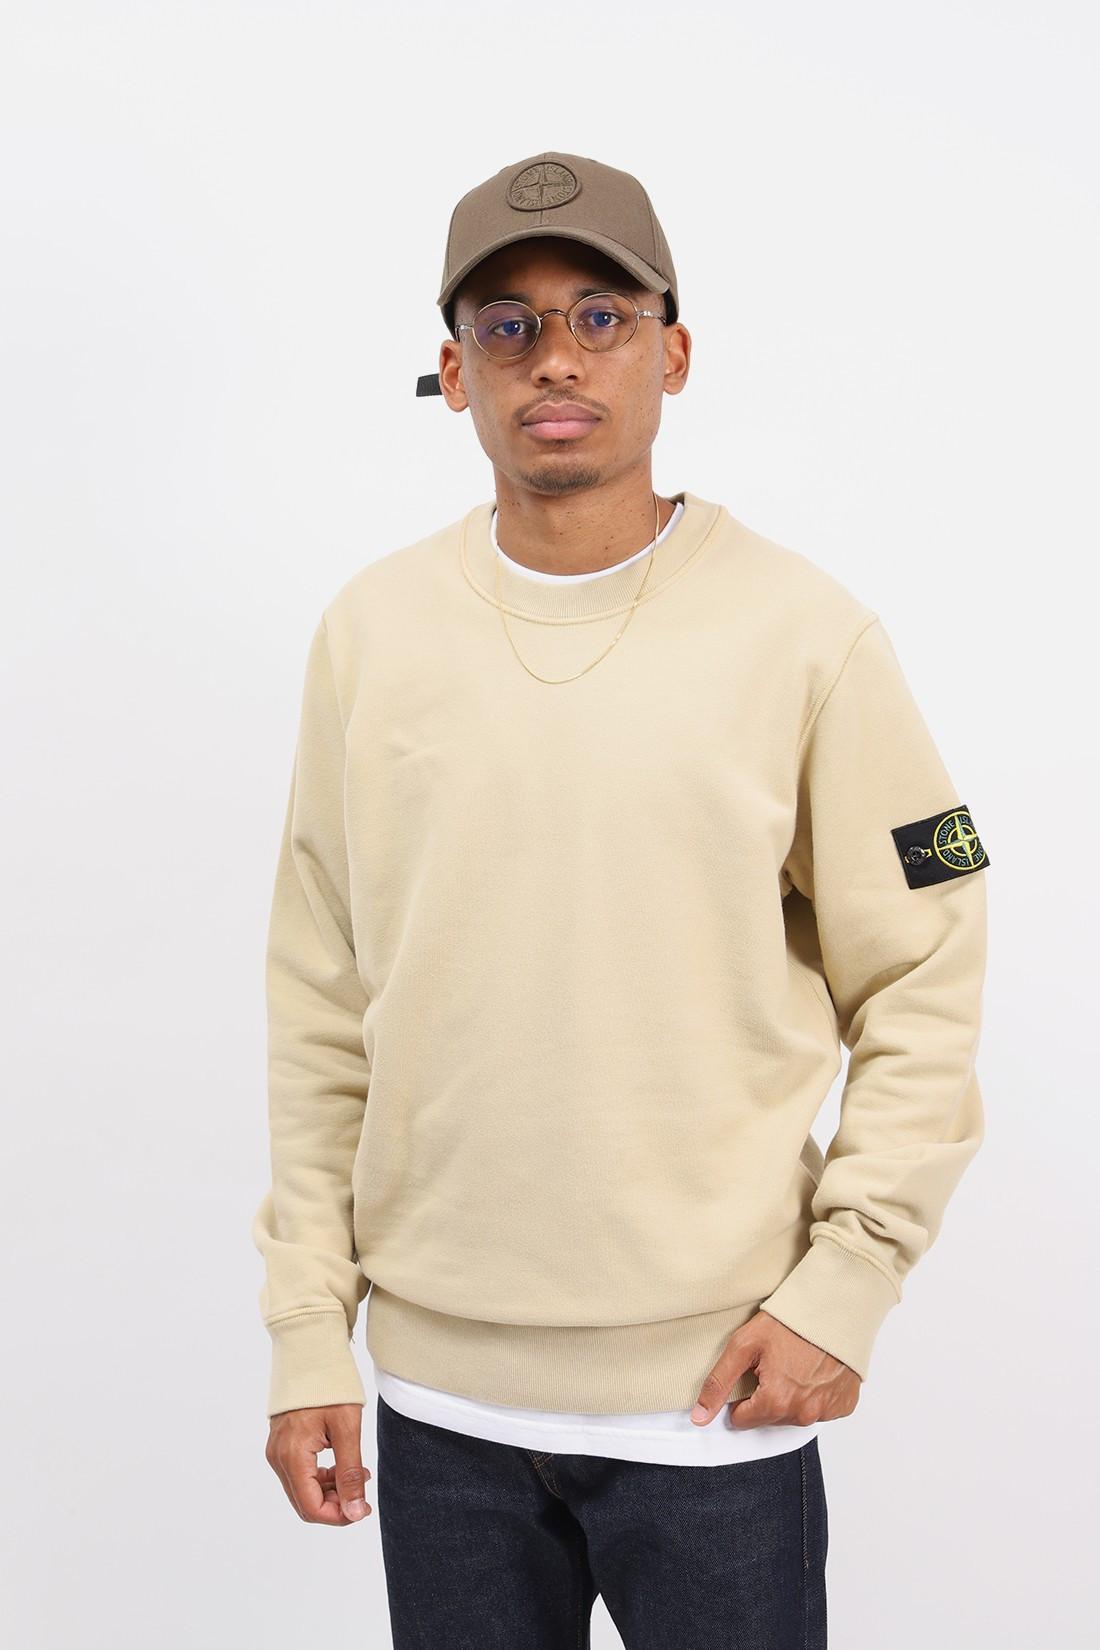 STONE ISLAND / 63020 crewneck sweater v0091 Ecru